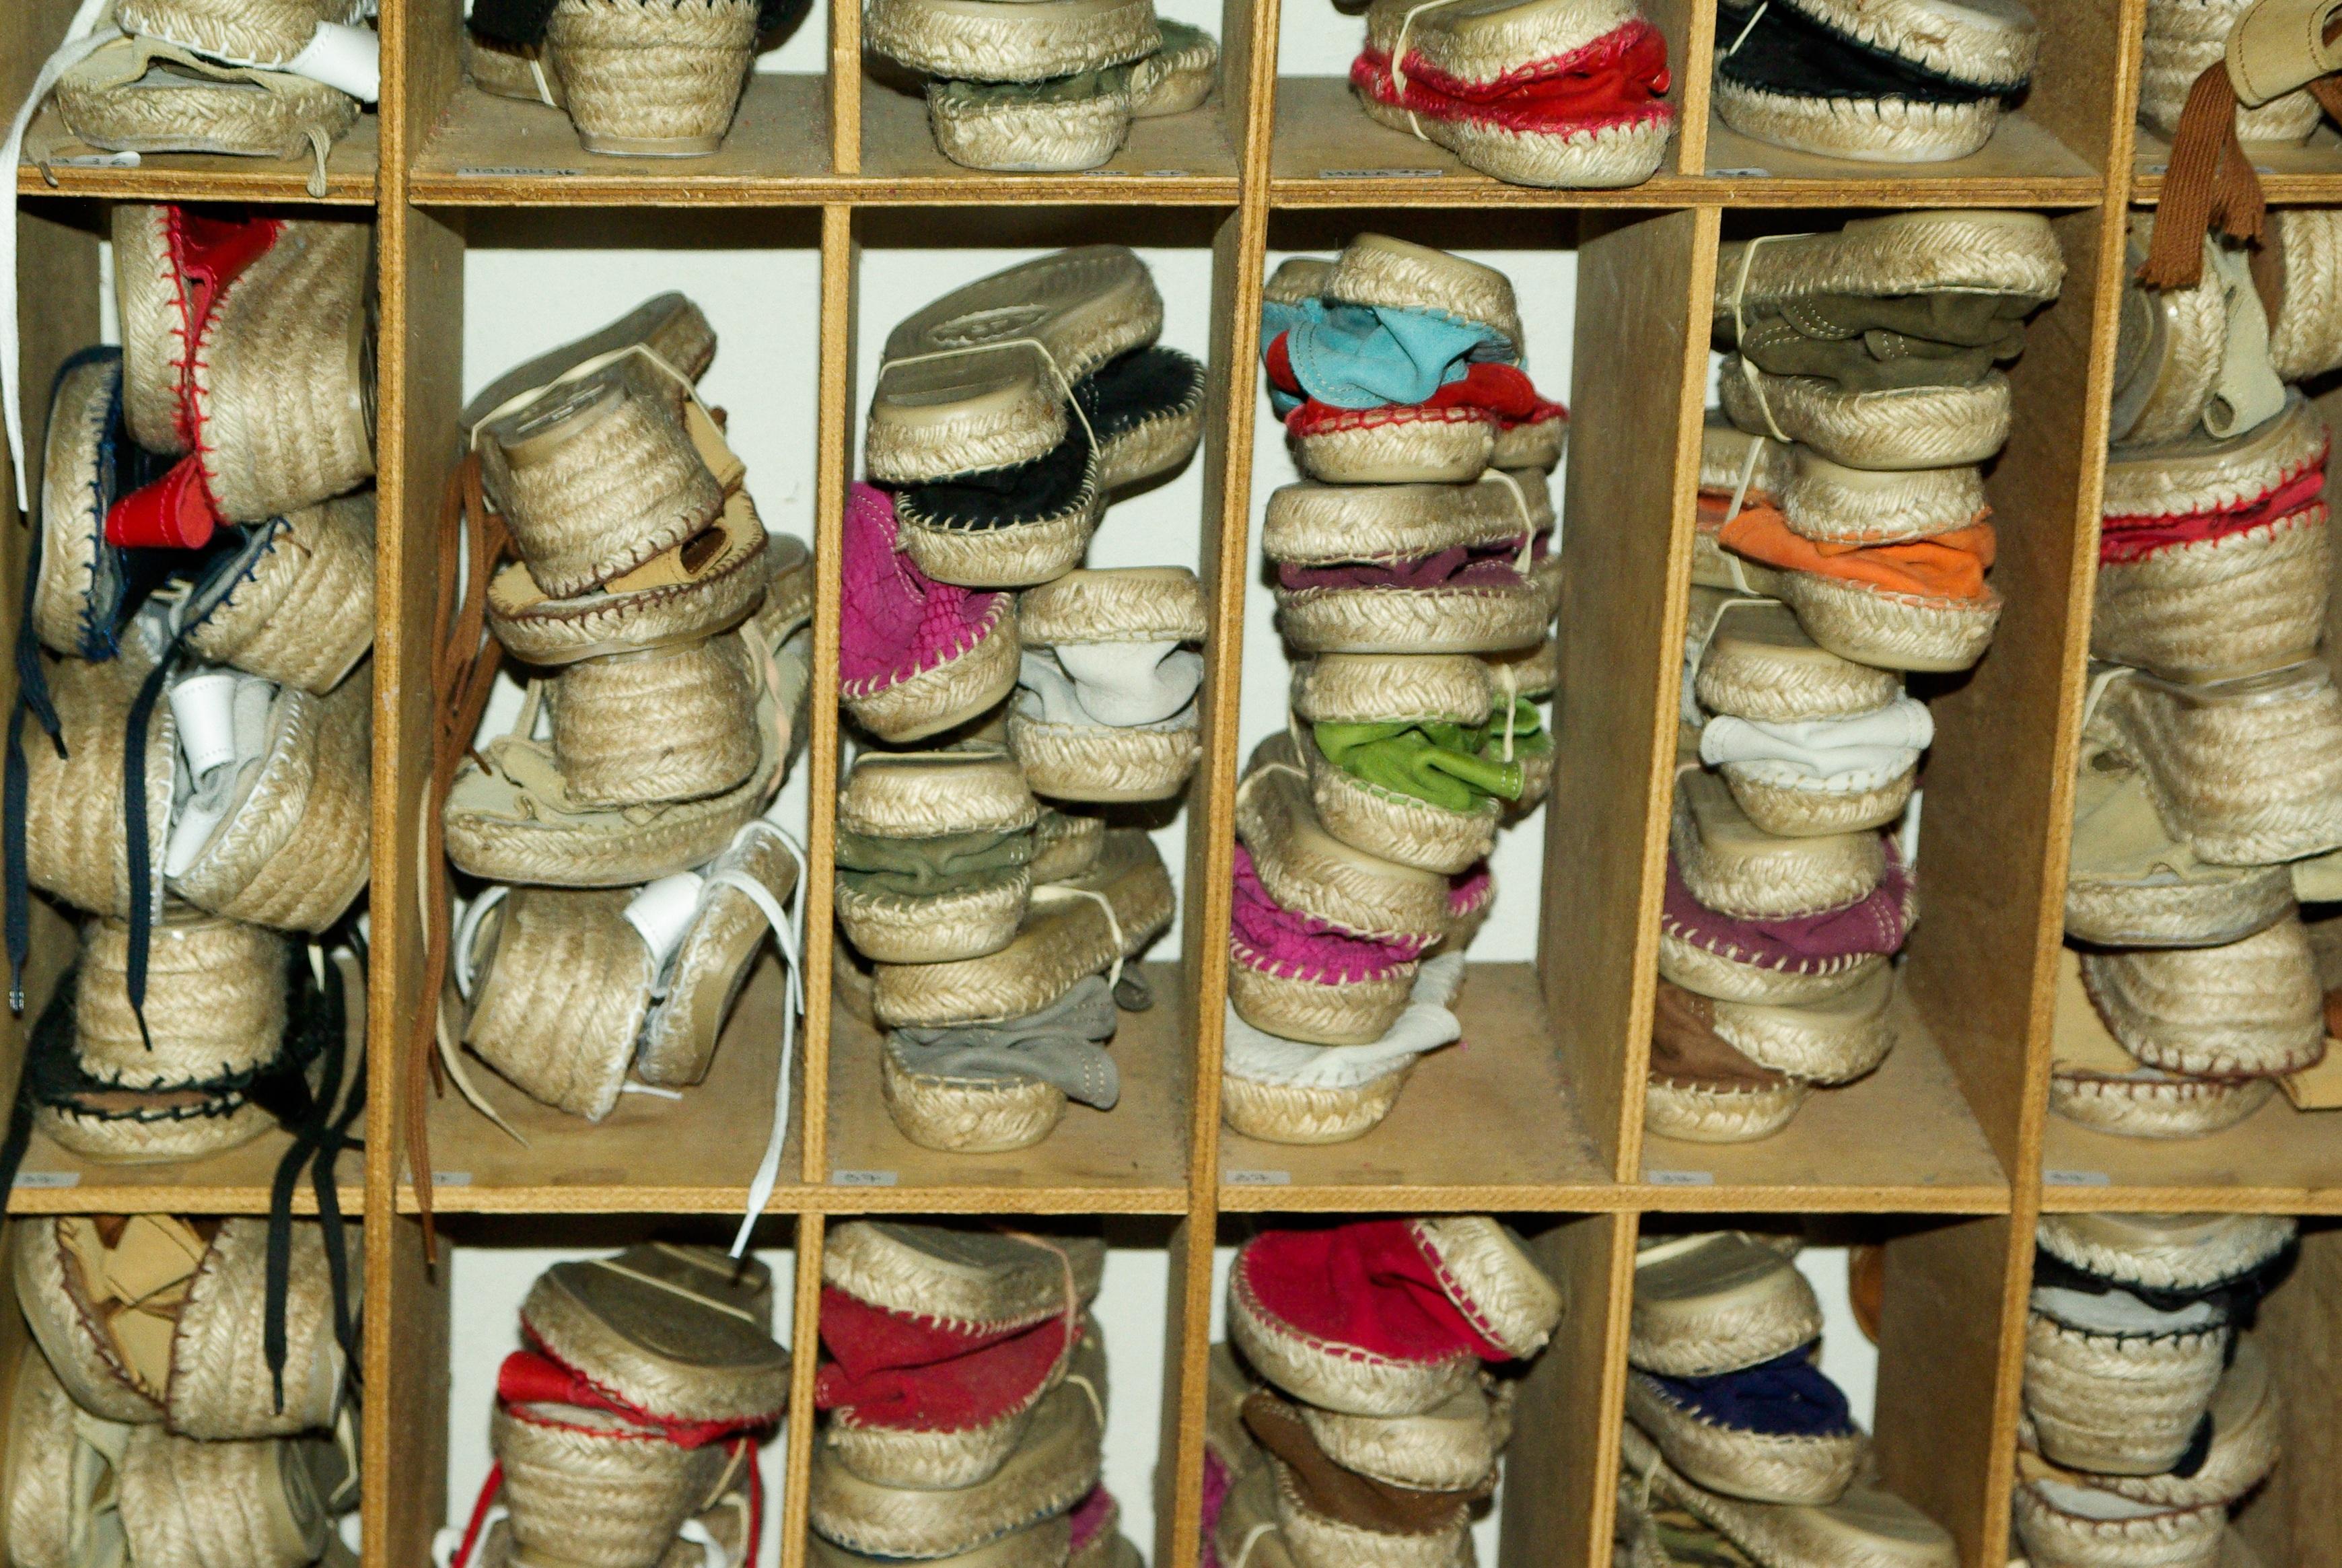 Kostenlose foto : Schuh, Seil, Holz, Frühling, Farbe, Schuhe